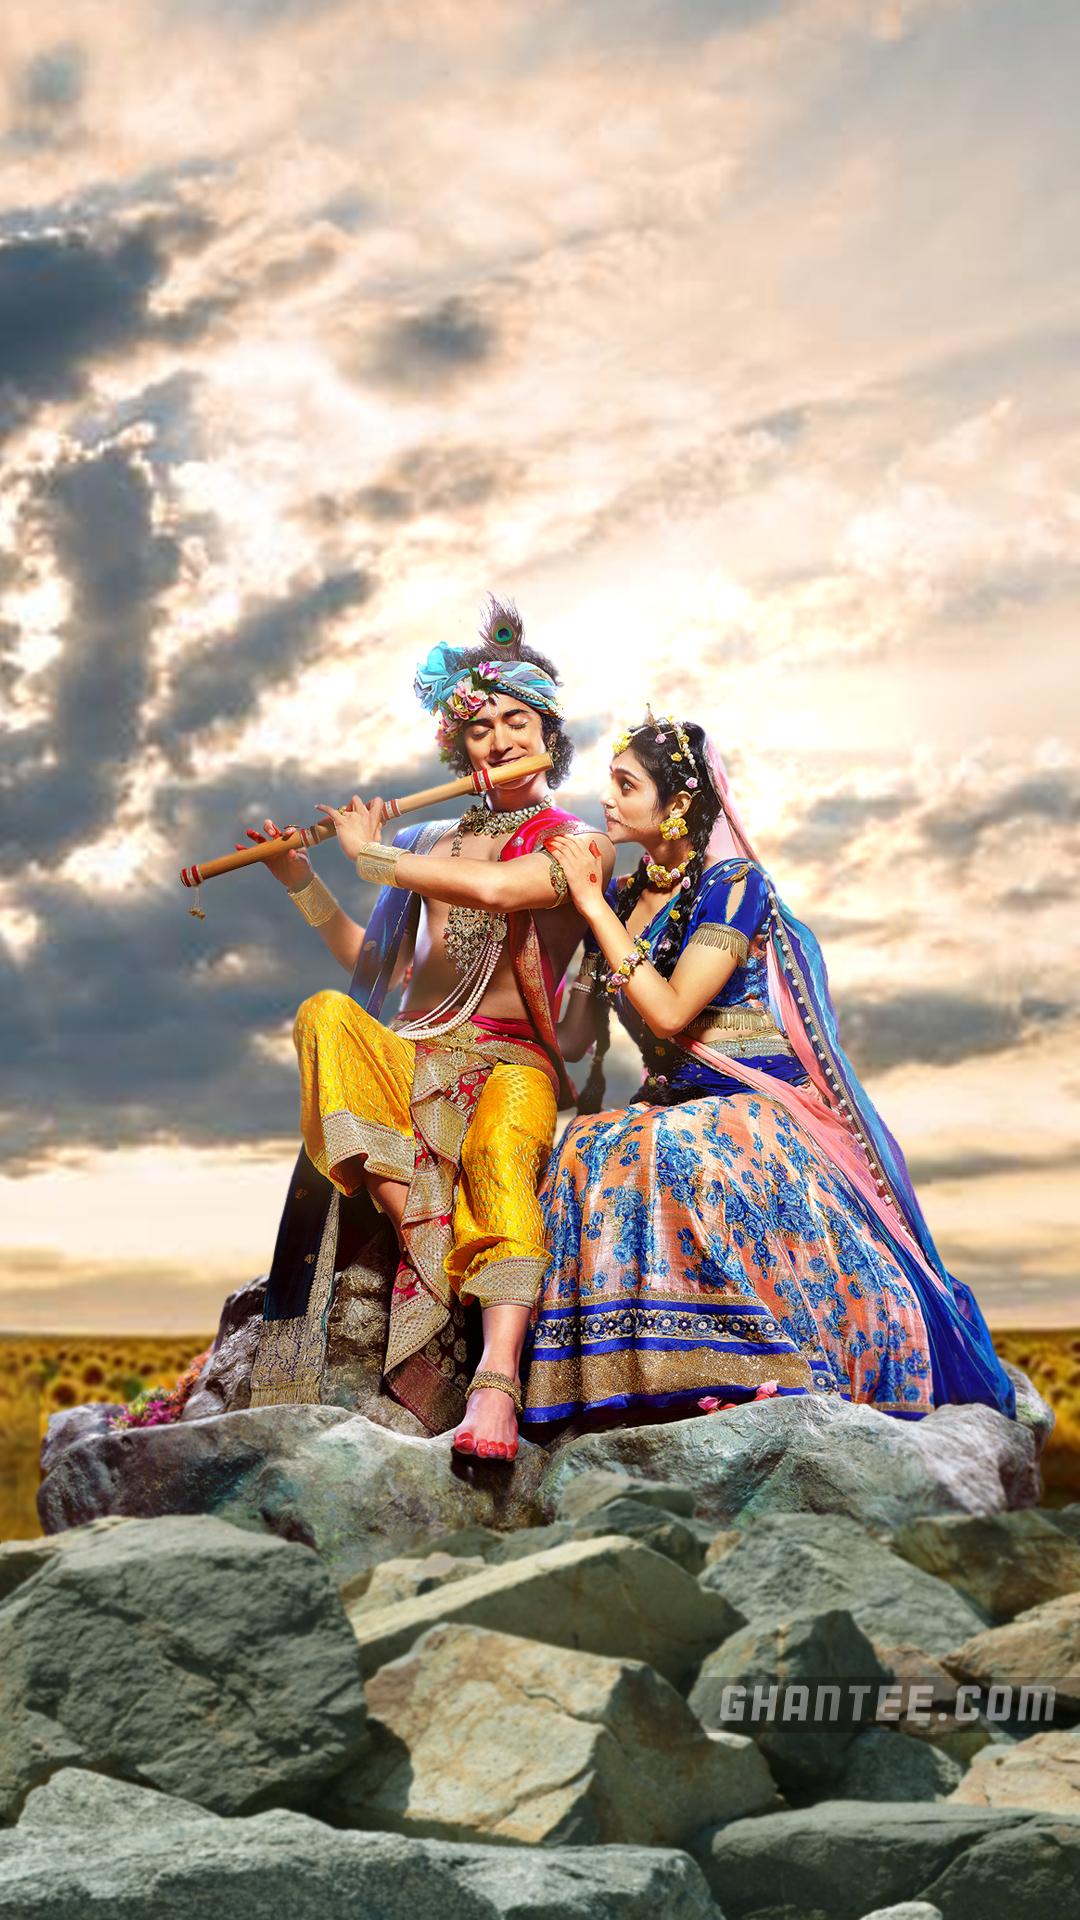 beautiful radhakrishna wallpaper hd download